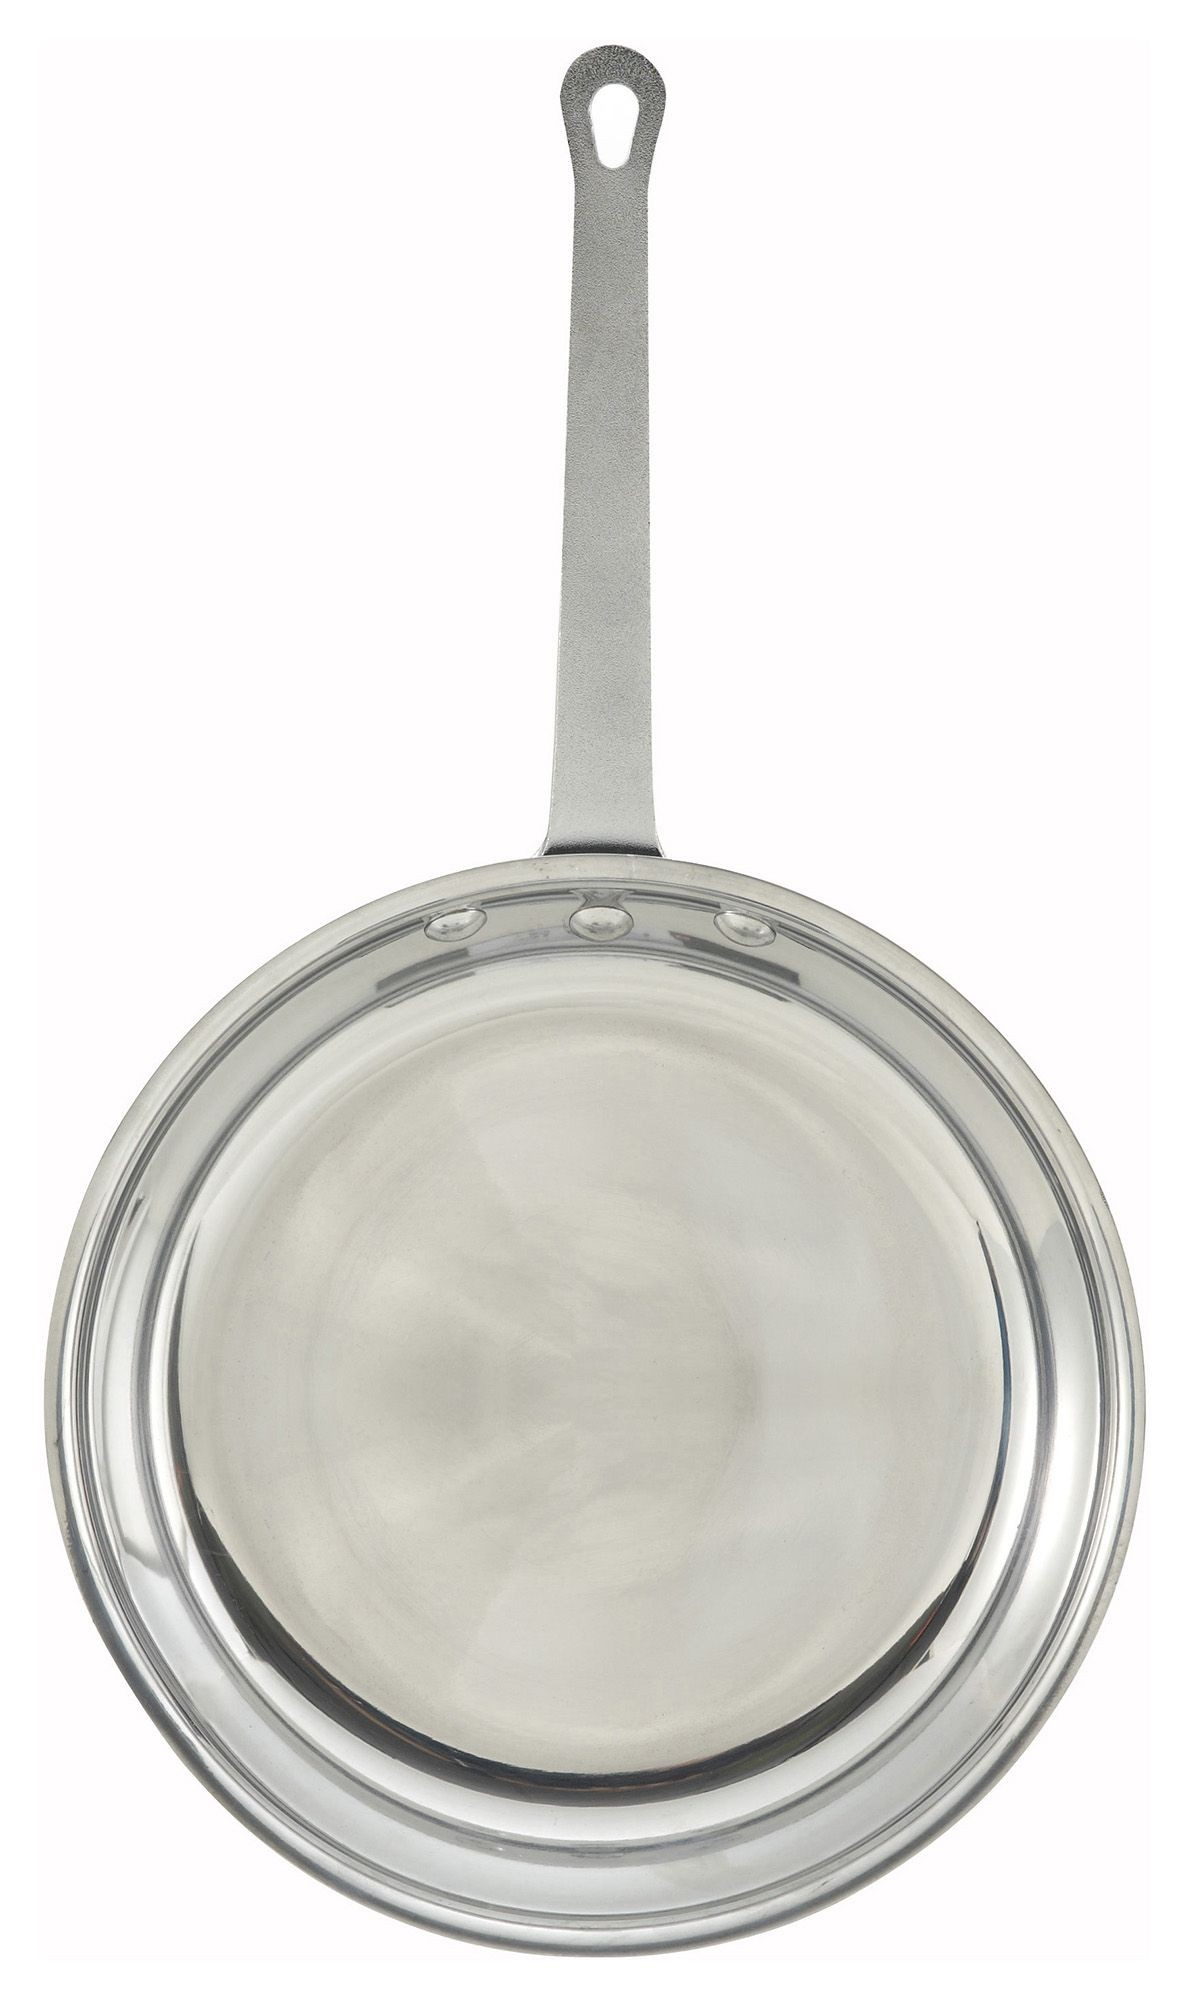 "10"" Majestic Aluminum Fry Pan"